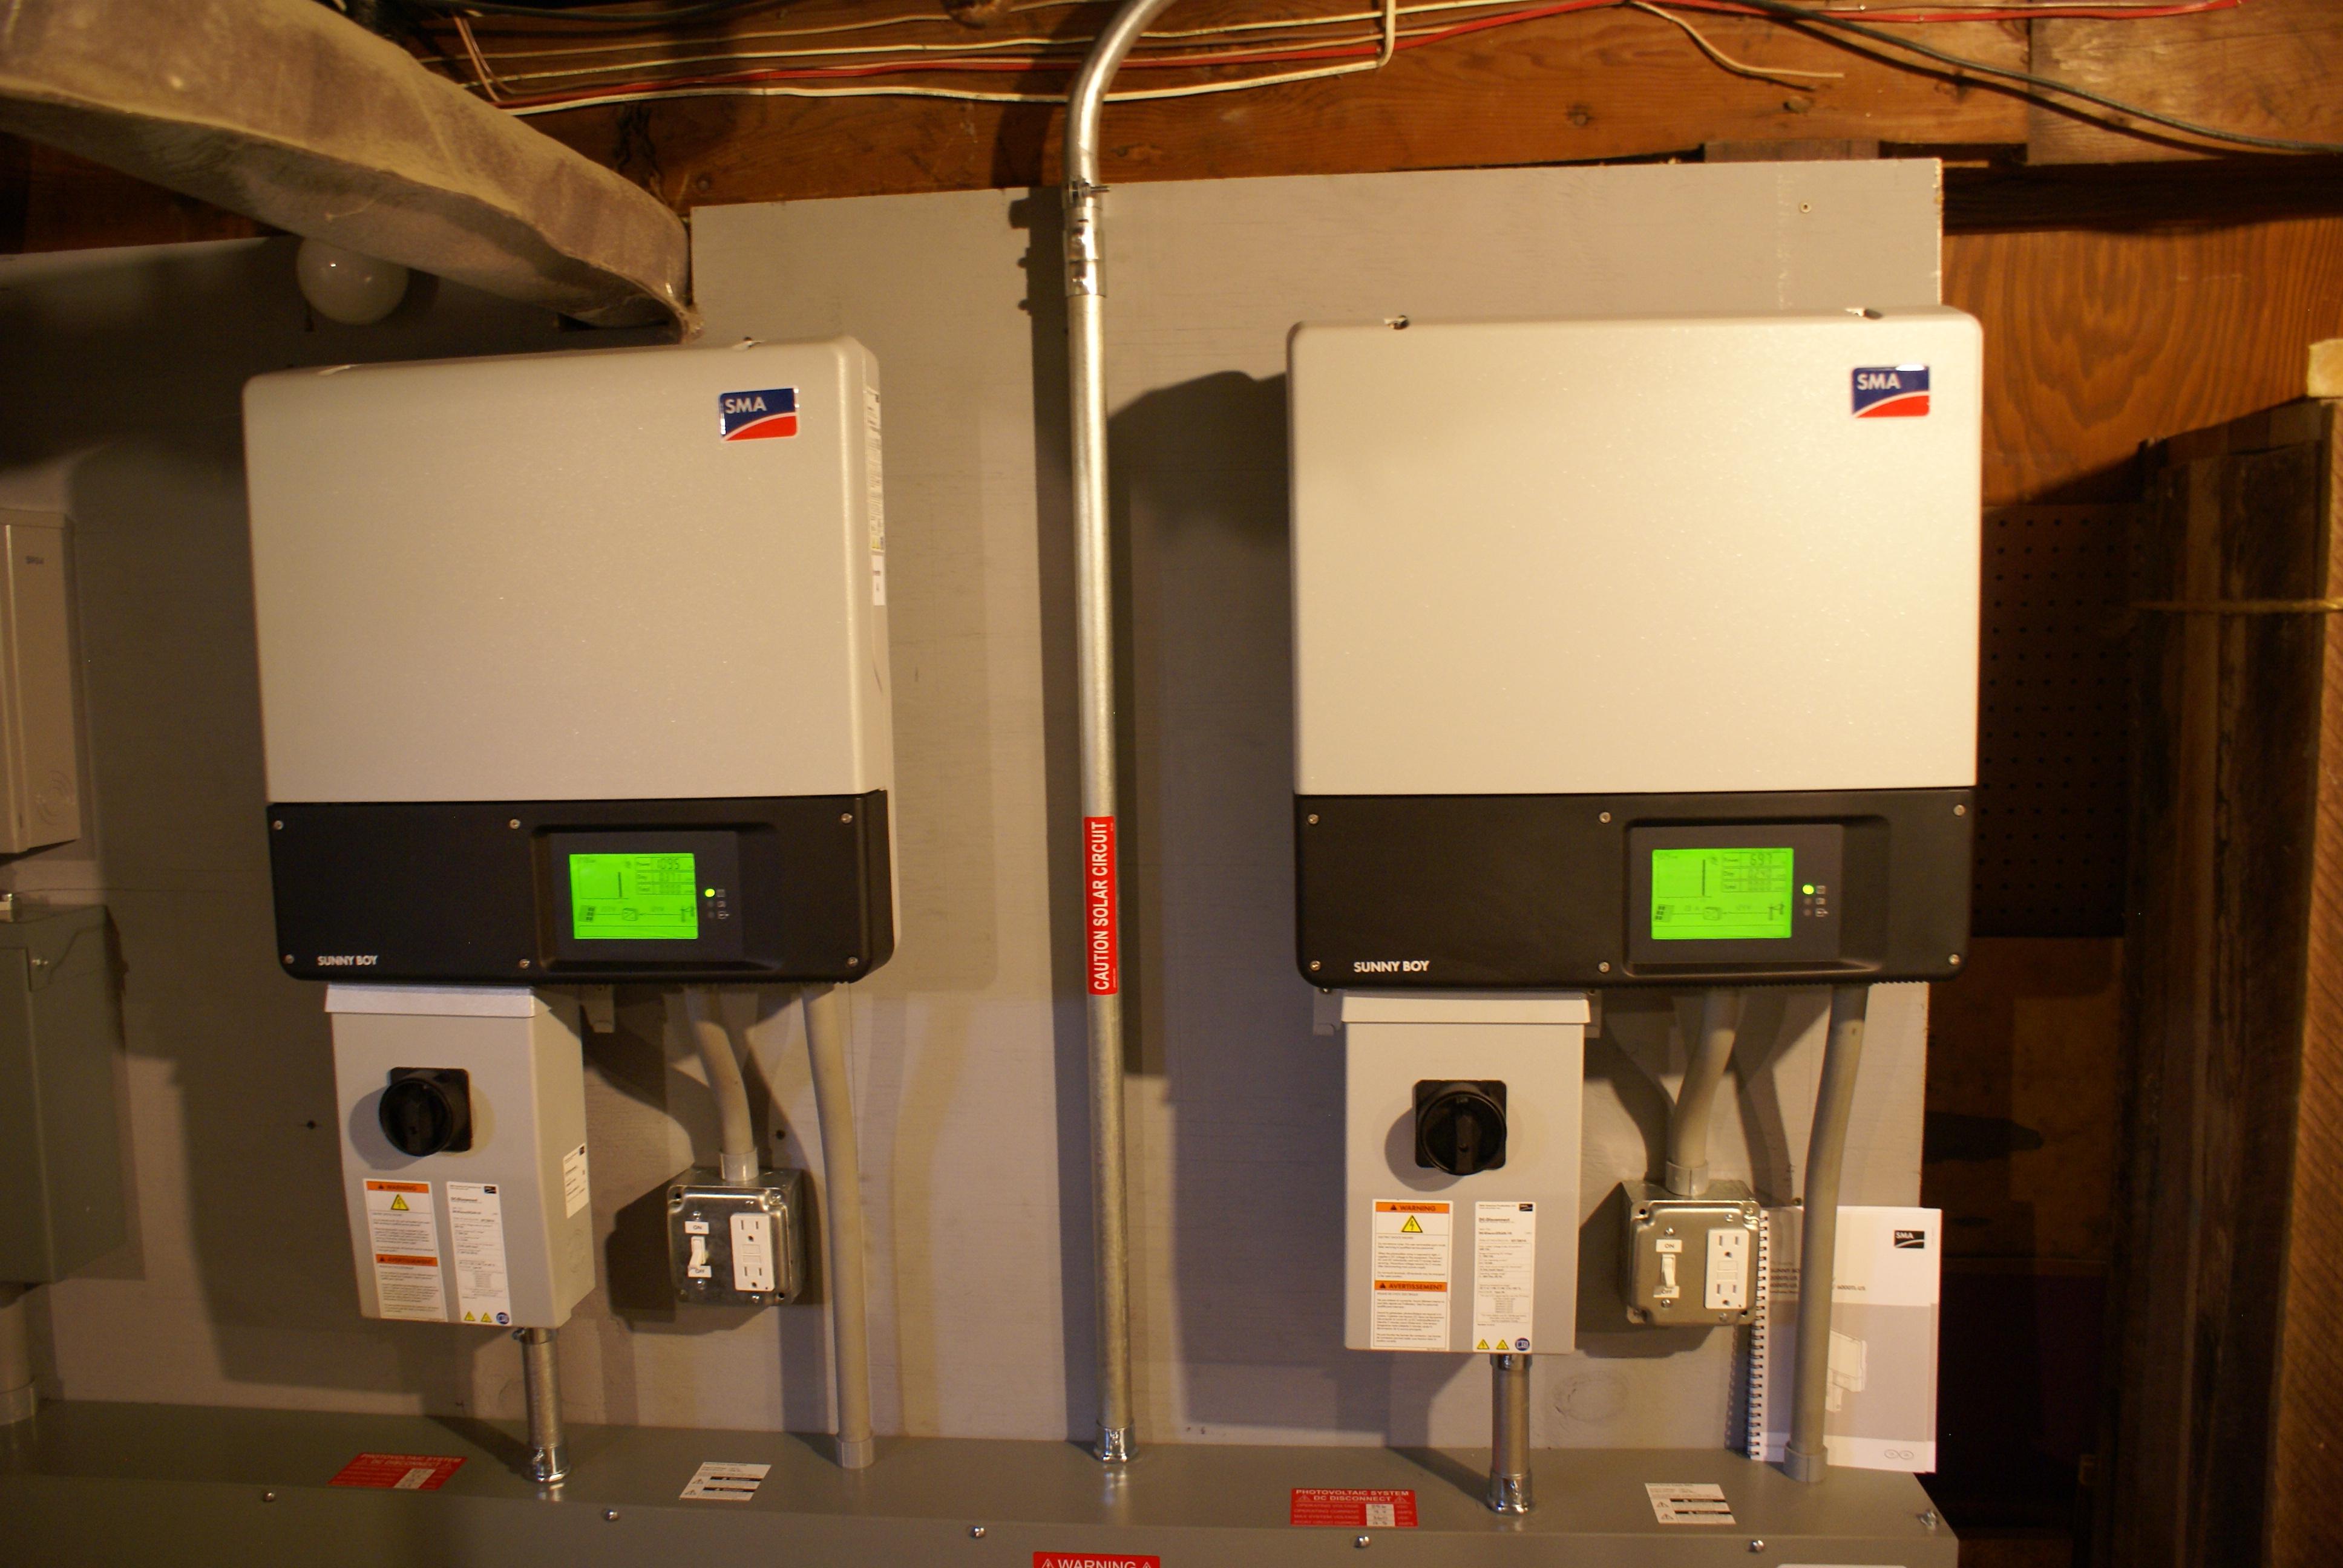 SMA SB 3800TL-US-22 and SB 3000TL-US-22 Inverters